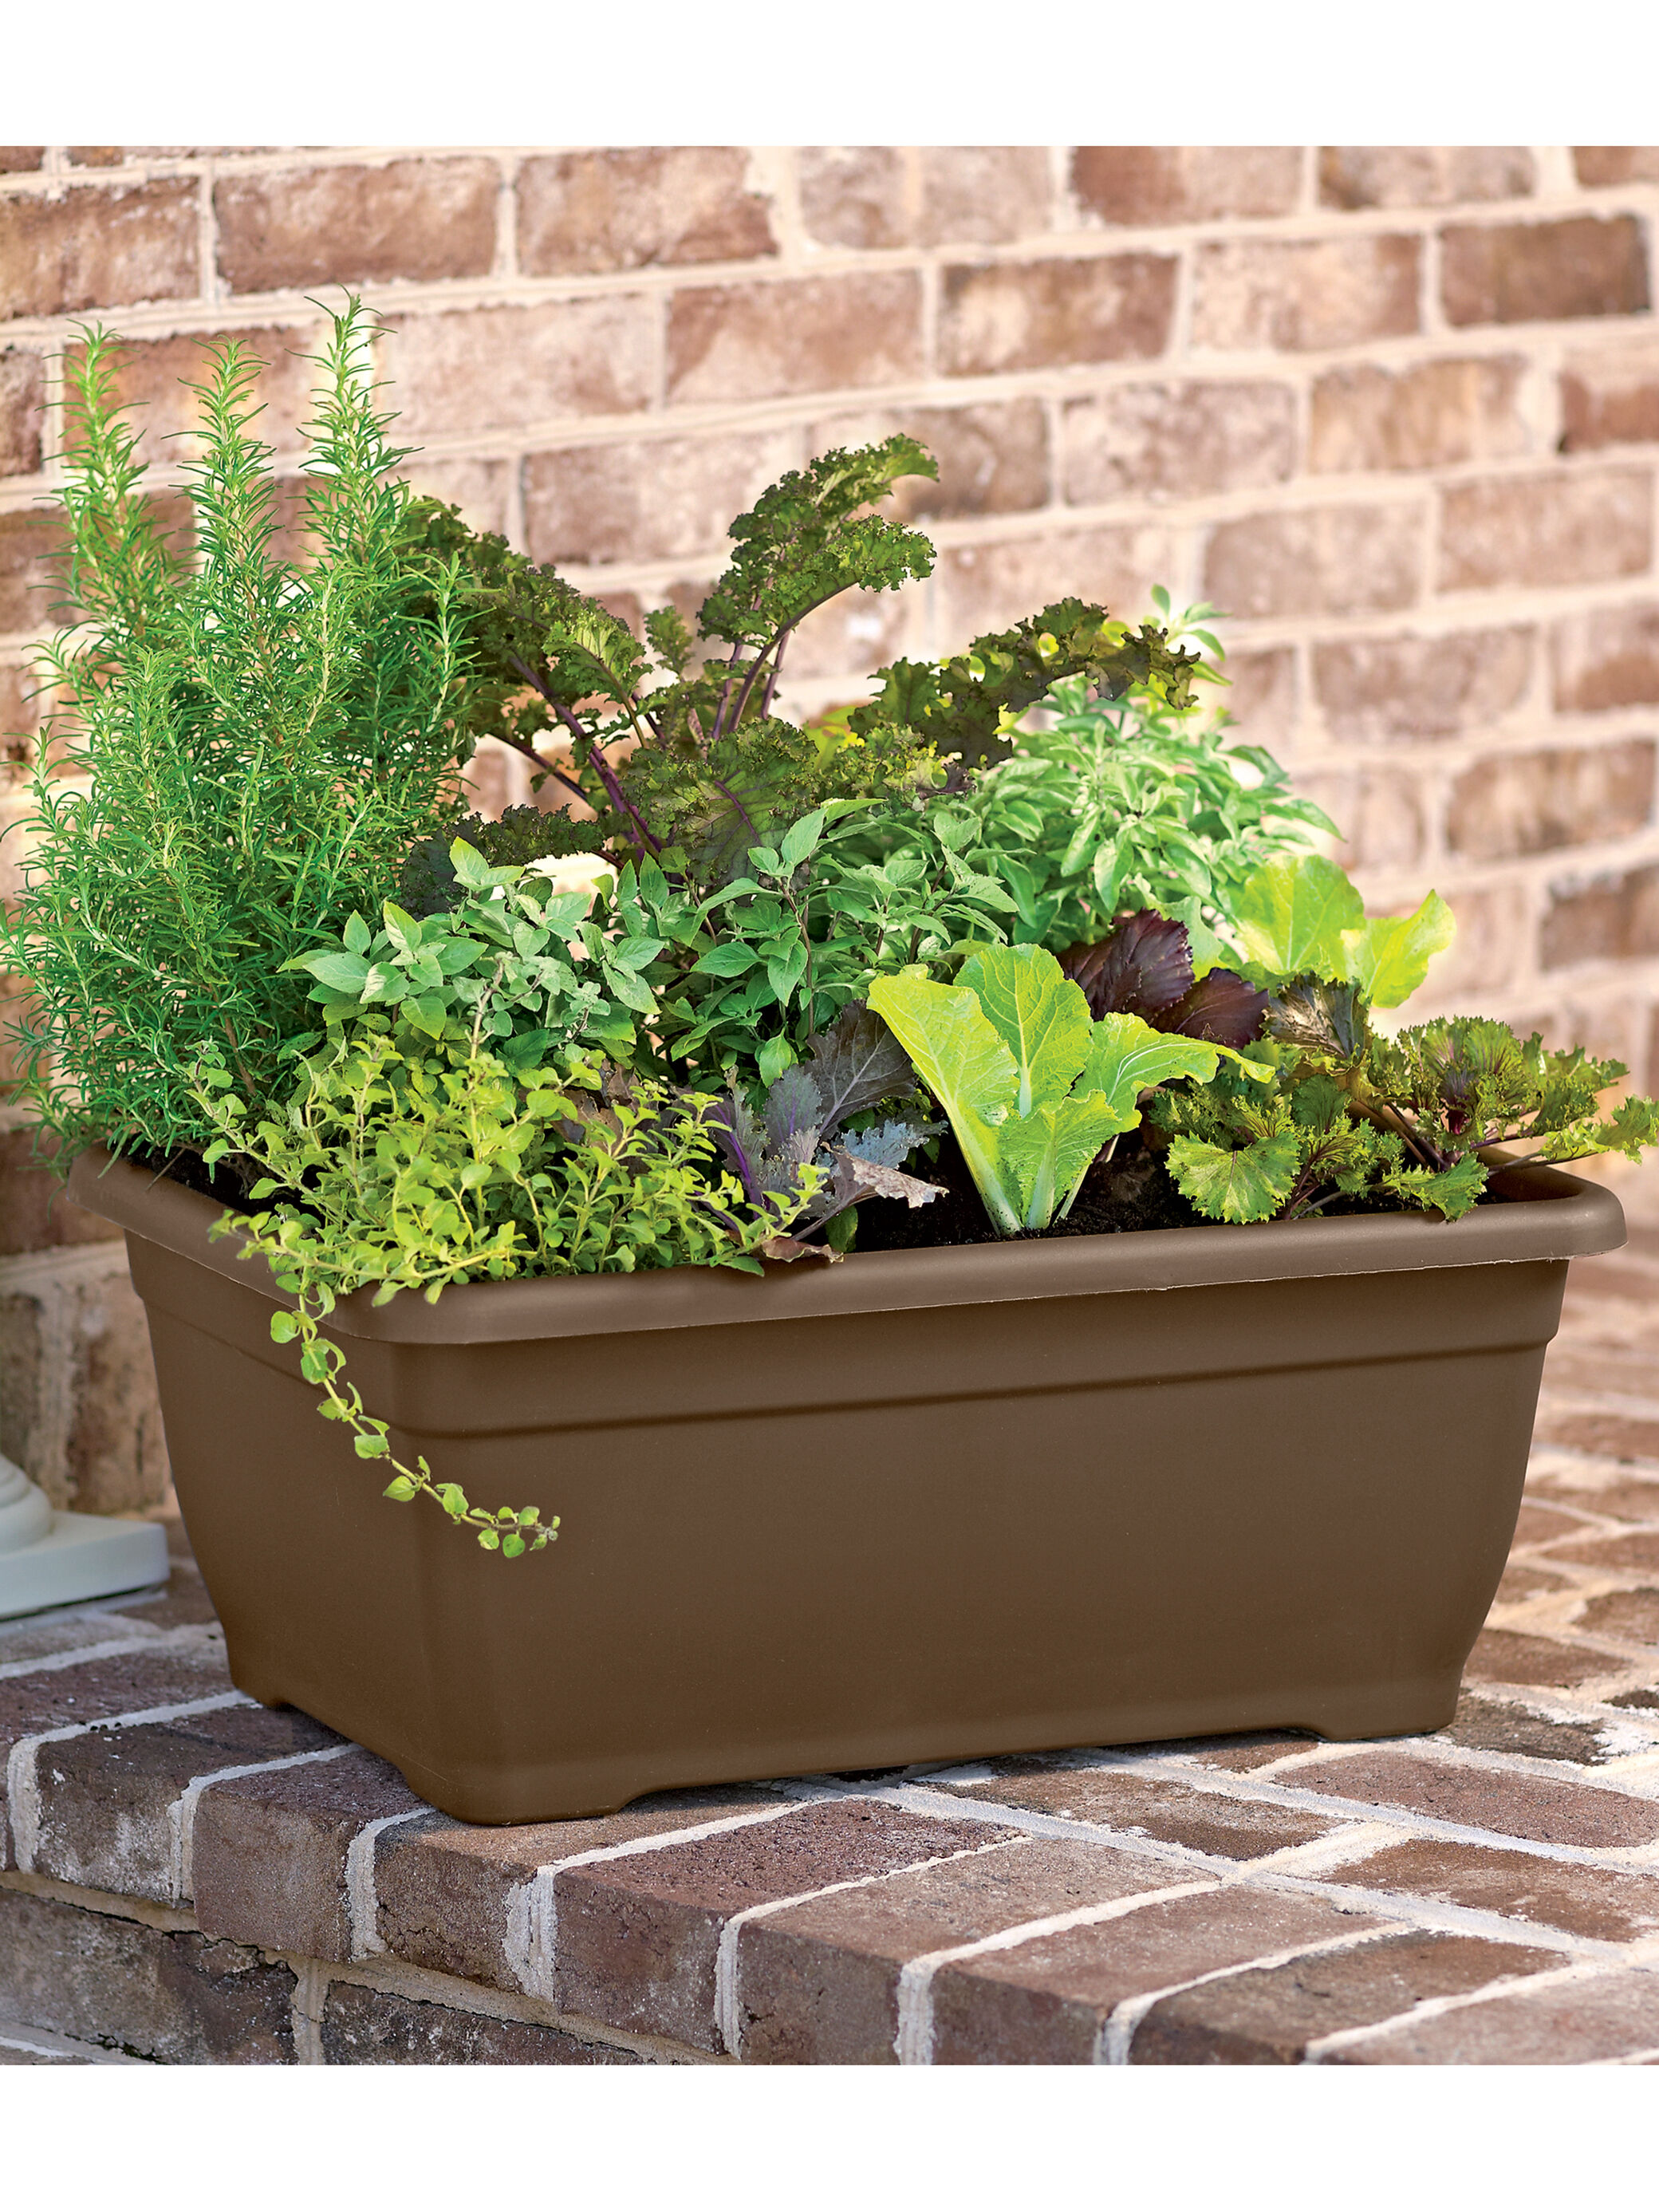 herb planter - -watering patio